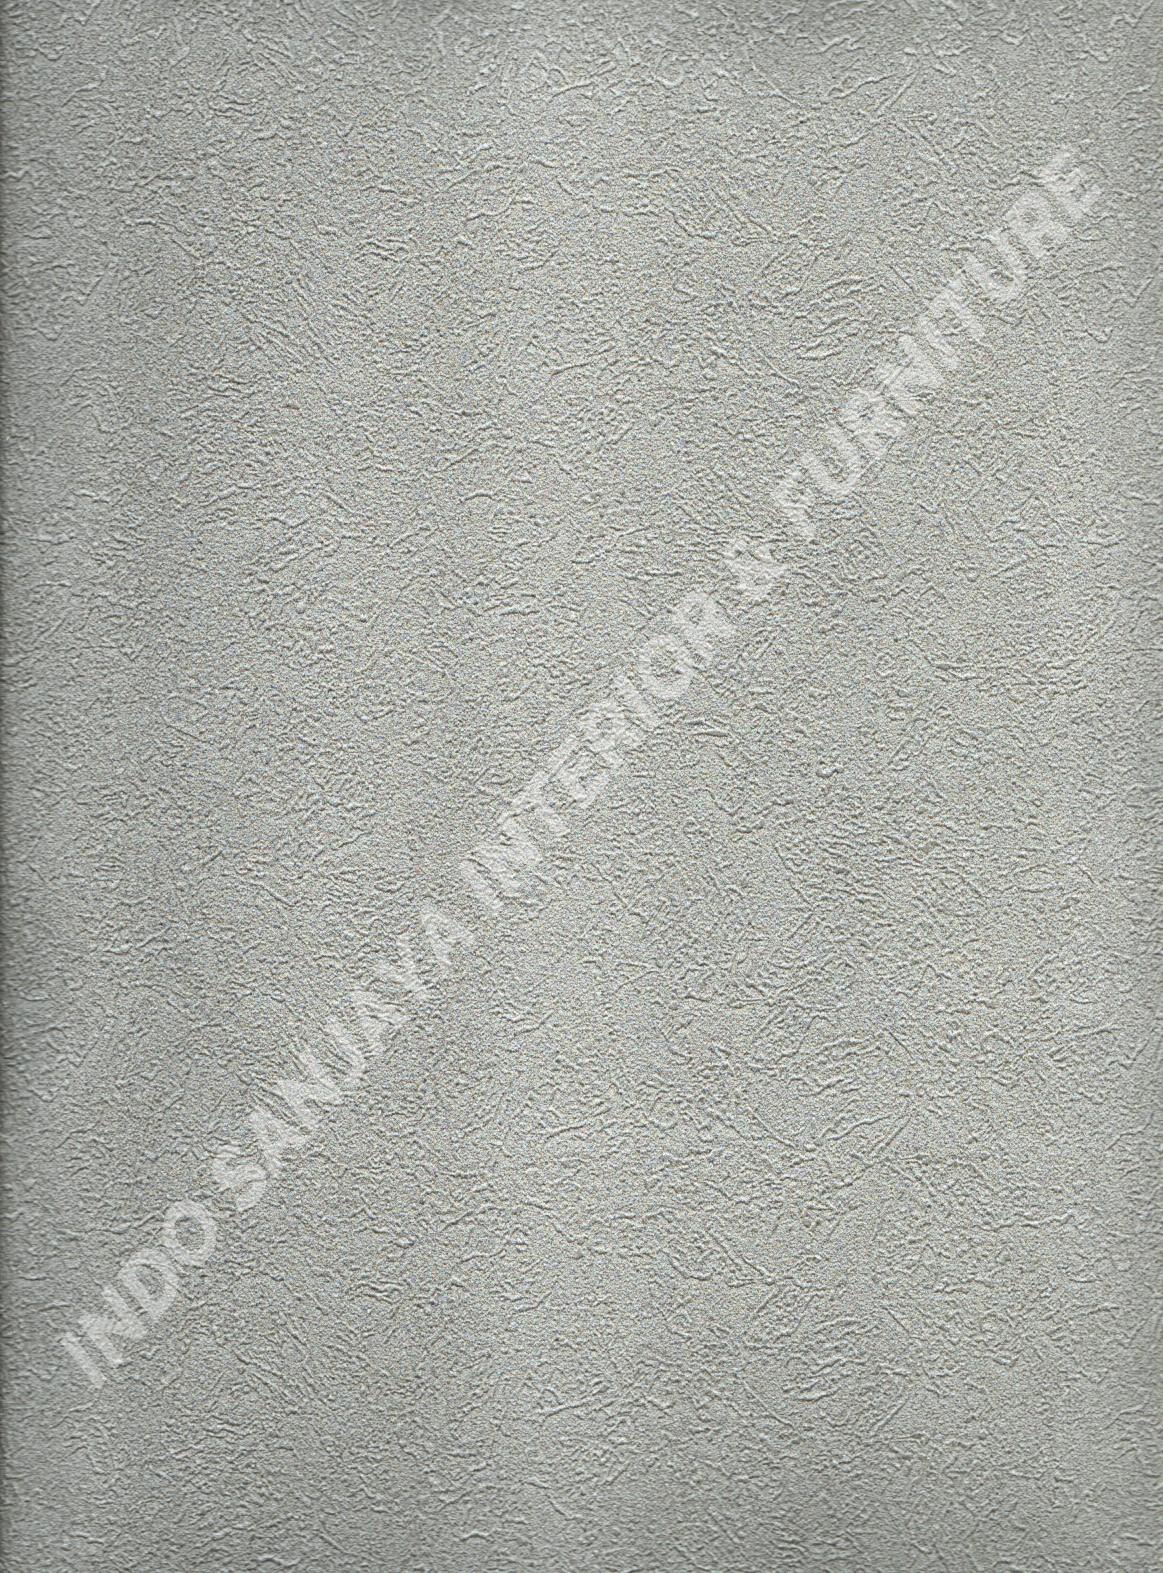 wallpaper   Wallpaper Minimalis Polos 11094:11094 corak  warna